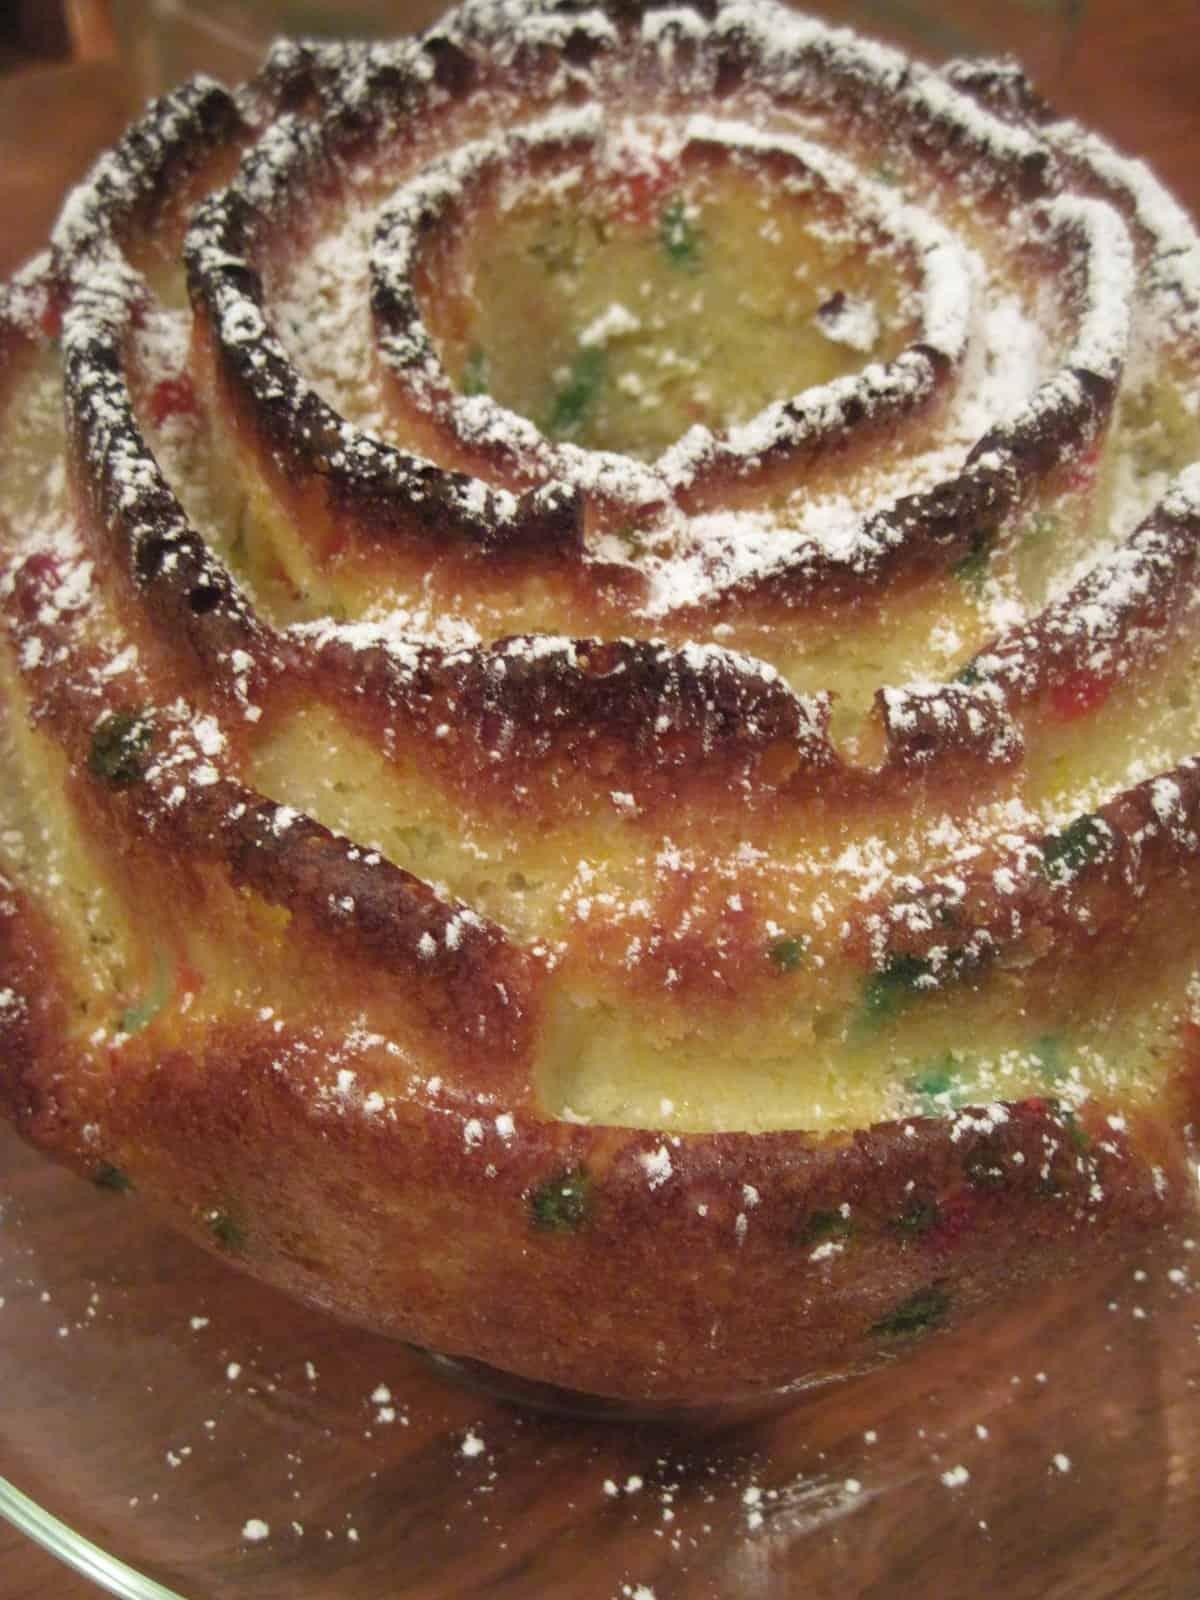 Easy Christmas Cake via @Mooreorlesscook